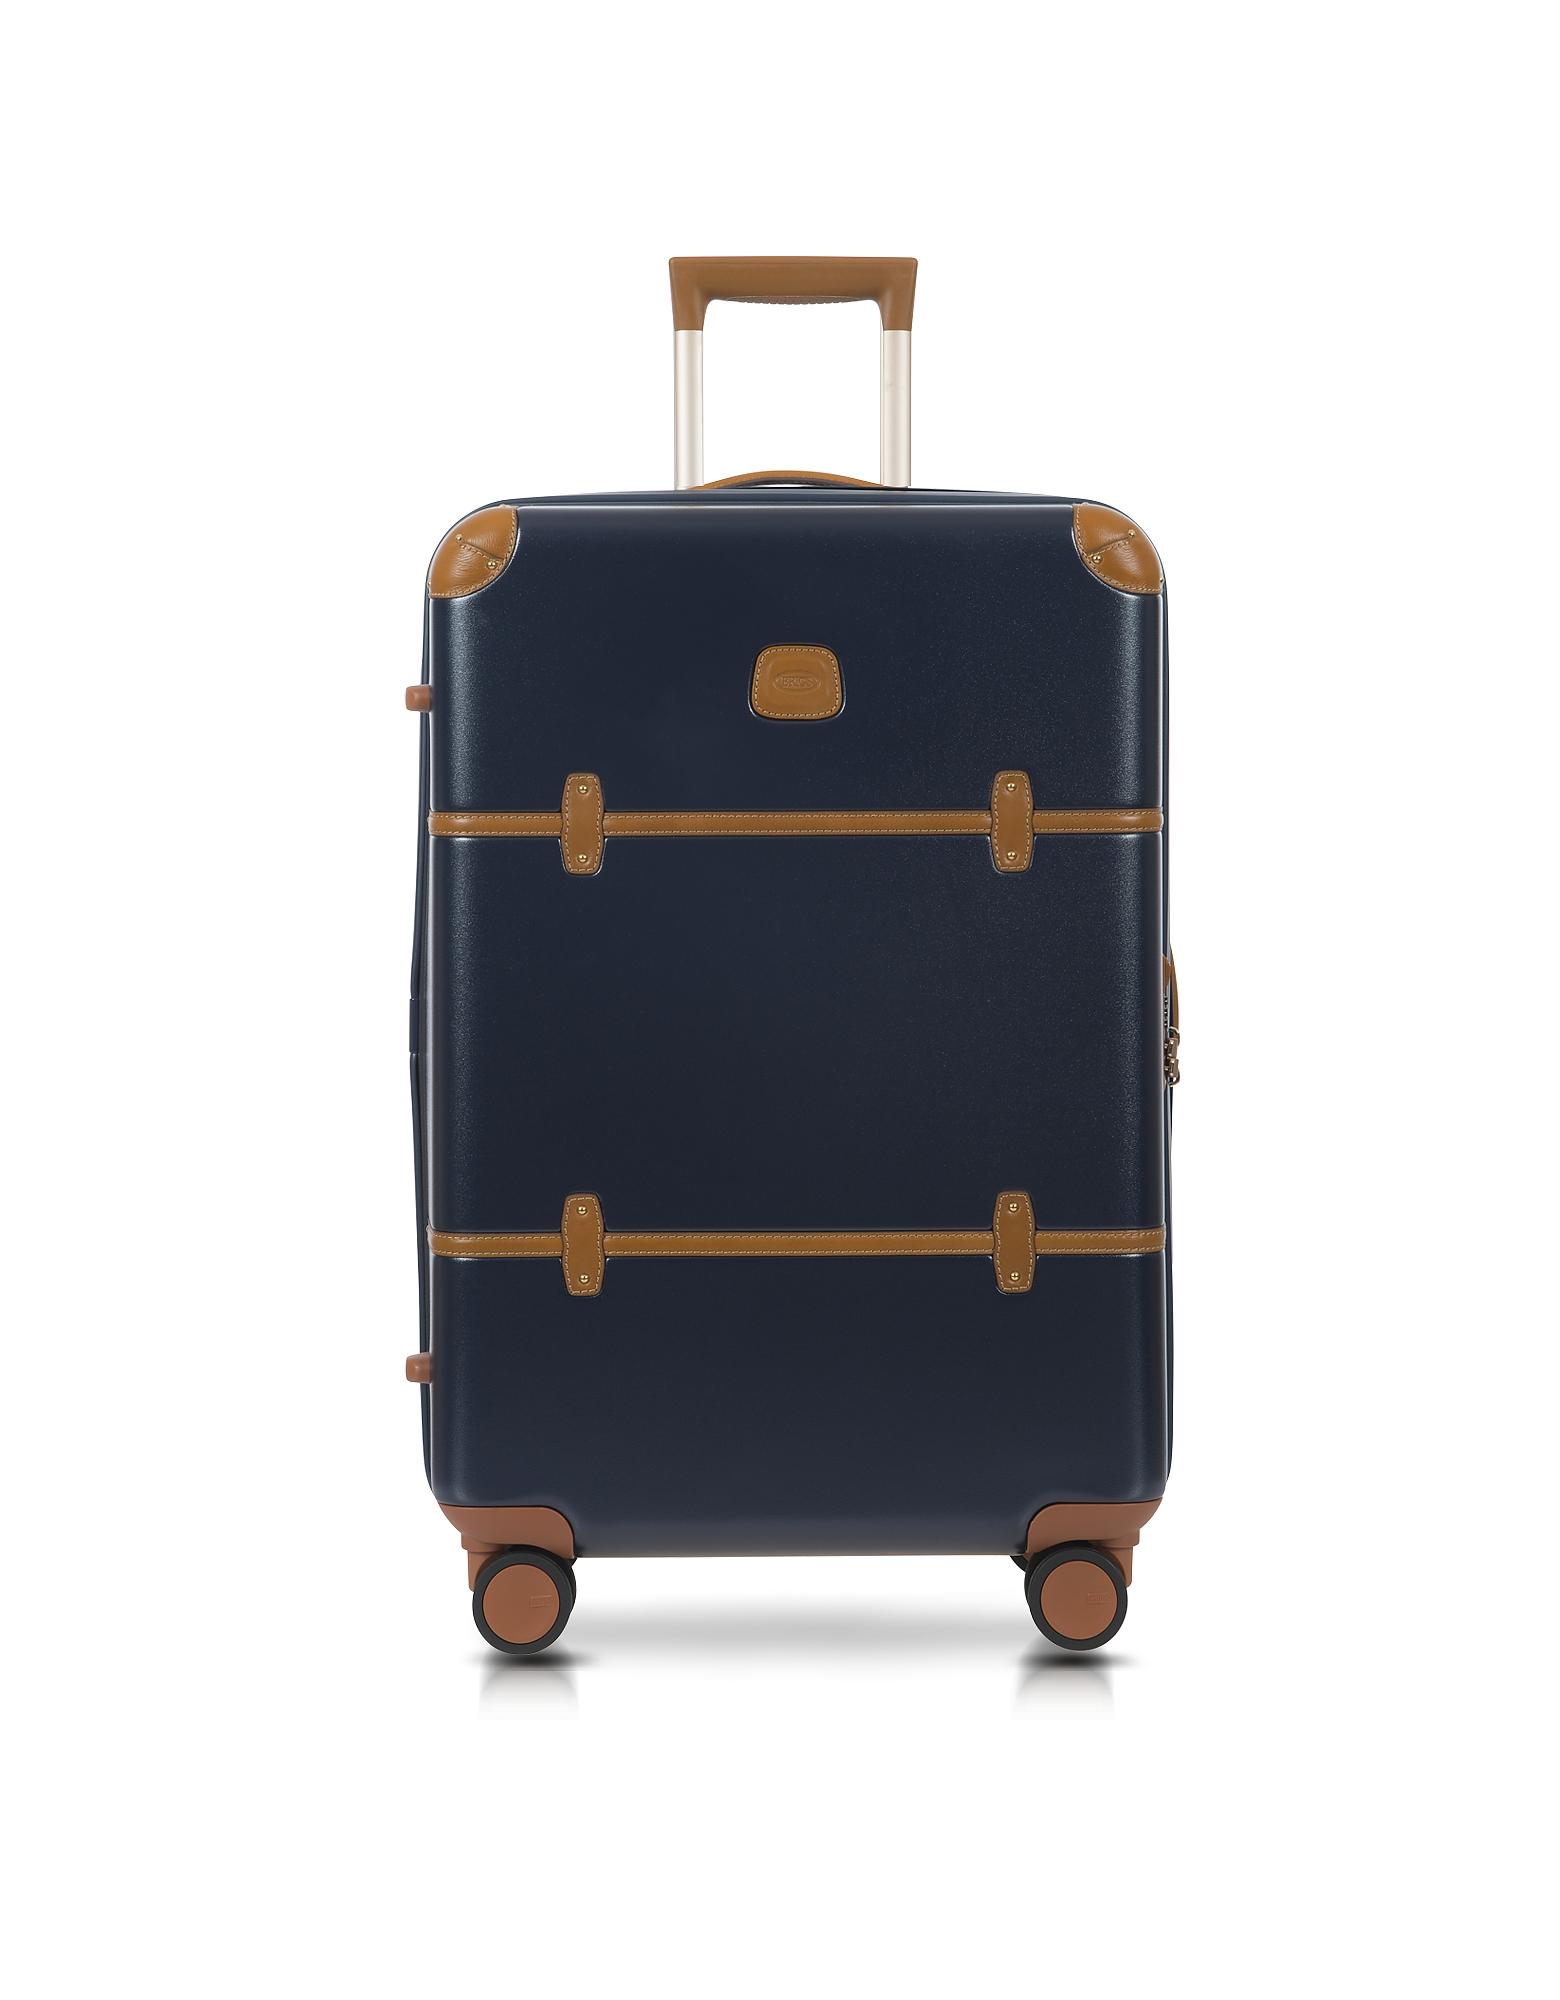 Bellagio V2.0 - Синий и Табачный Троллей 27? на Колесиках